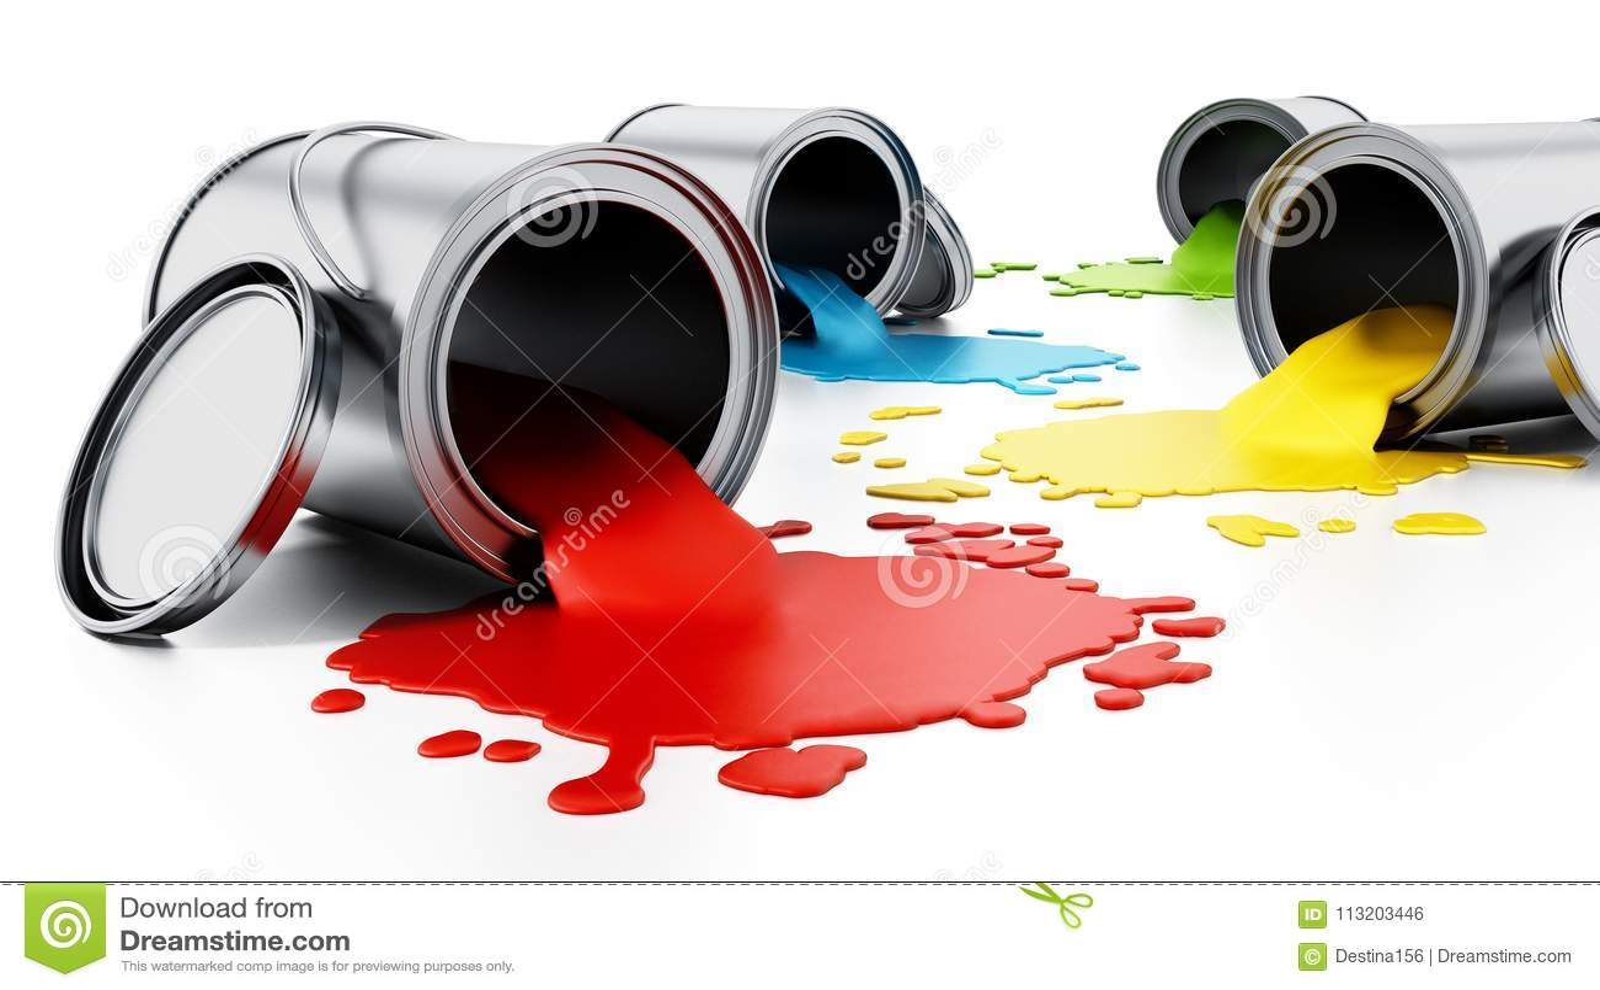 Open metal paint cans with spilled paints. 3D illustration